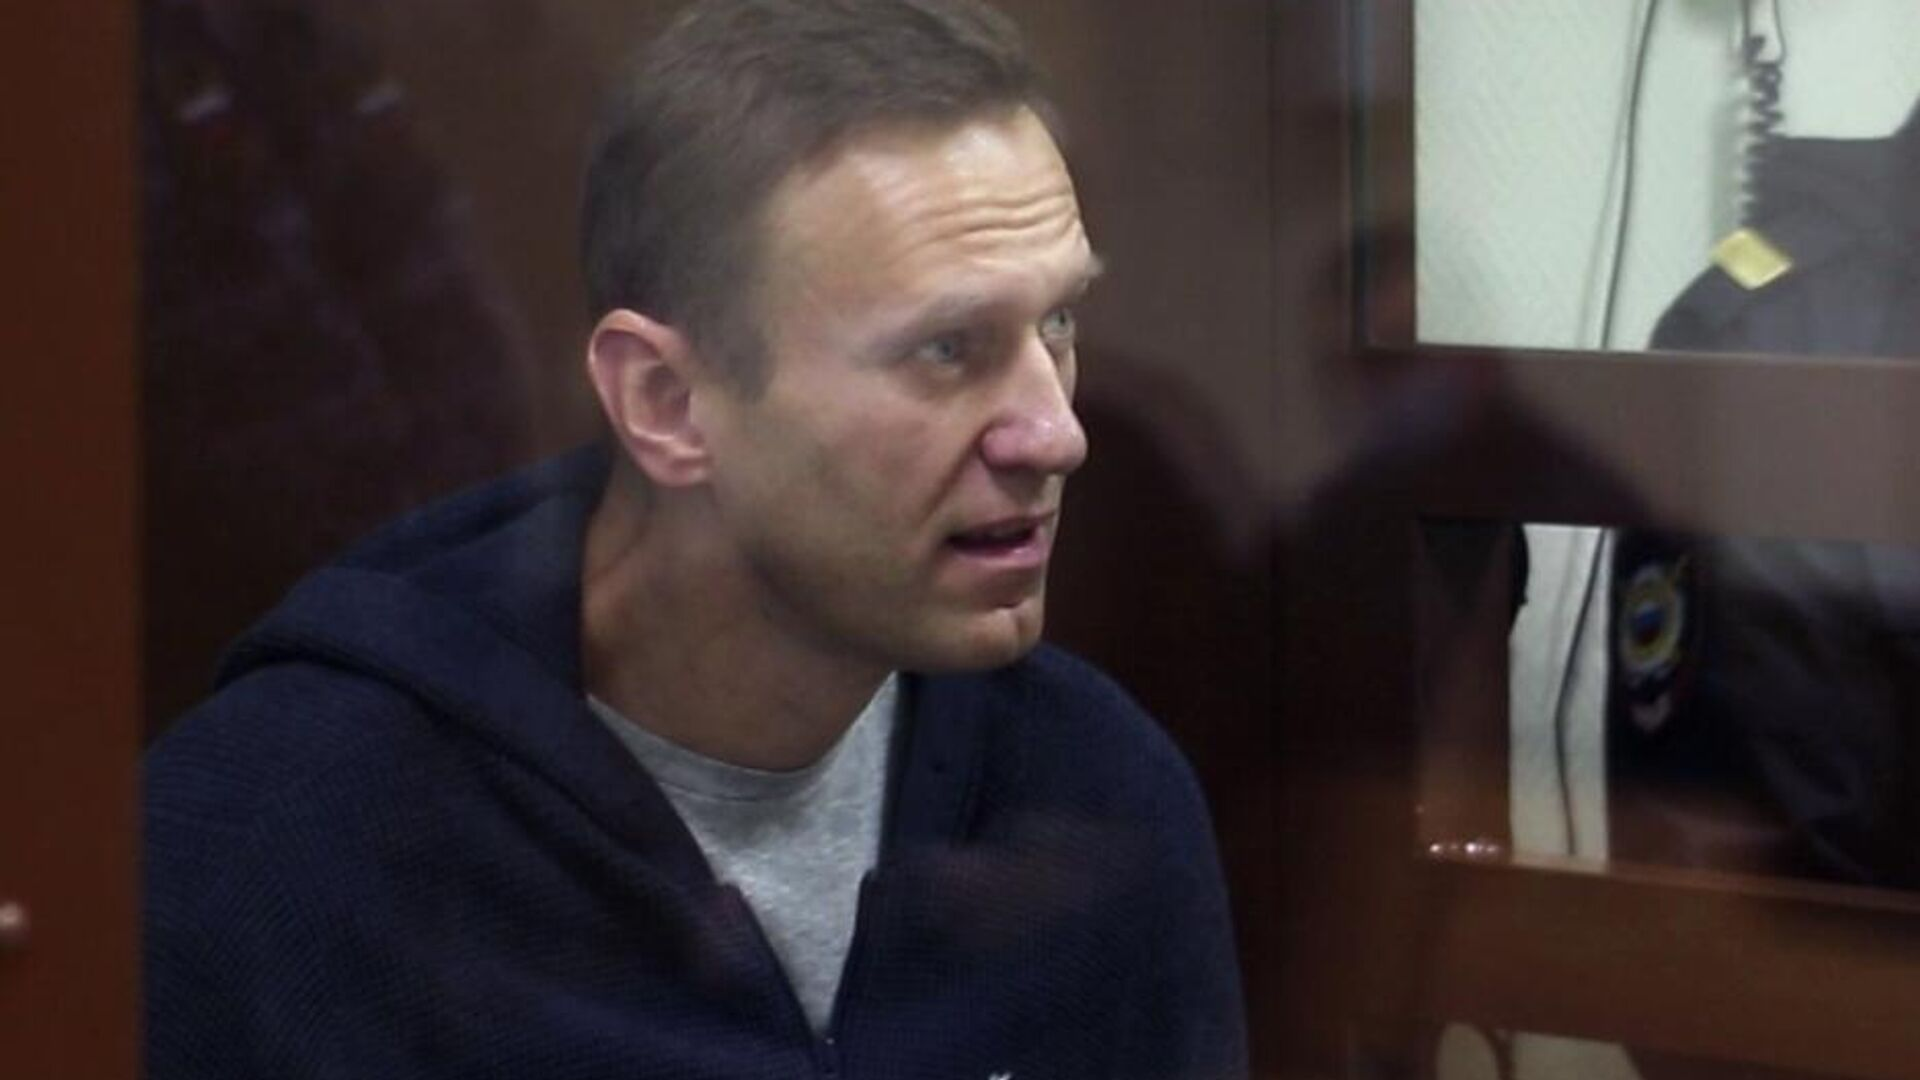 Alexéi Navalni, bloguero opositor ruso - Sputnik Mundo, 1920, 30.04.2021